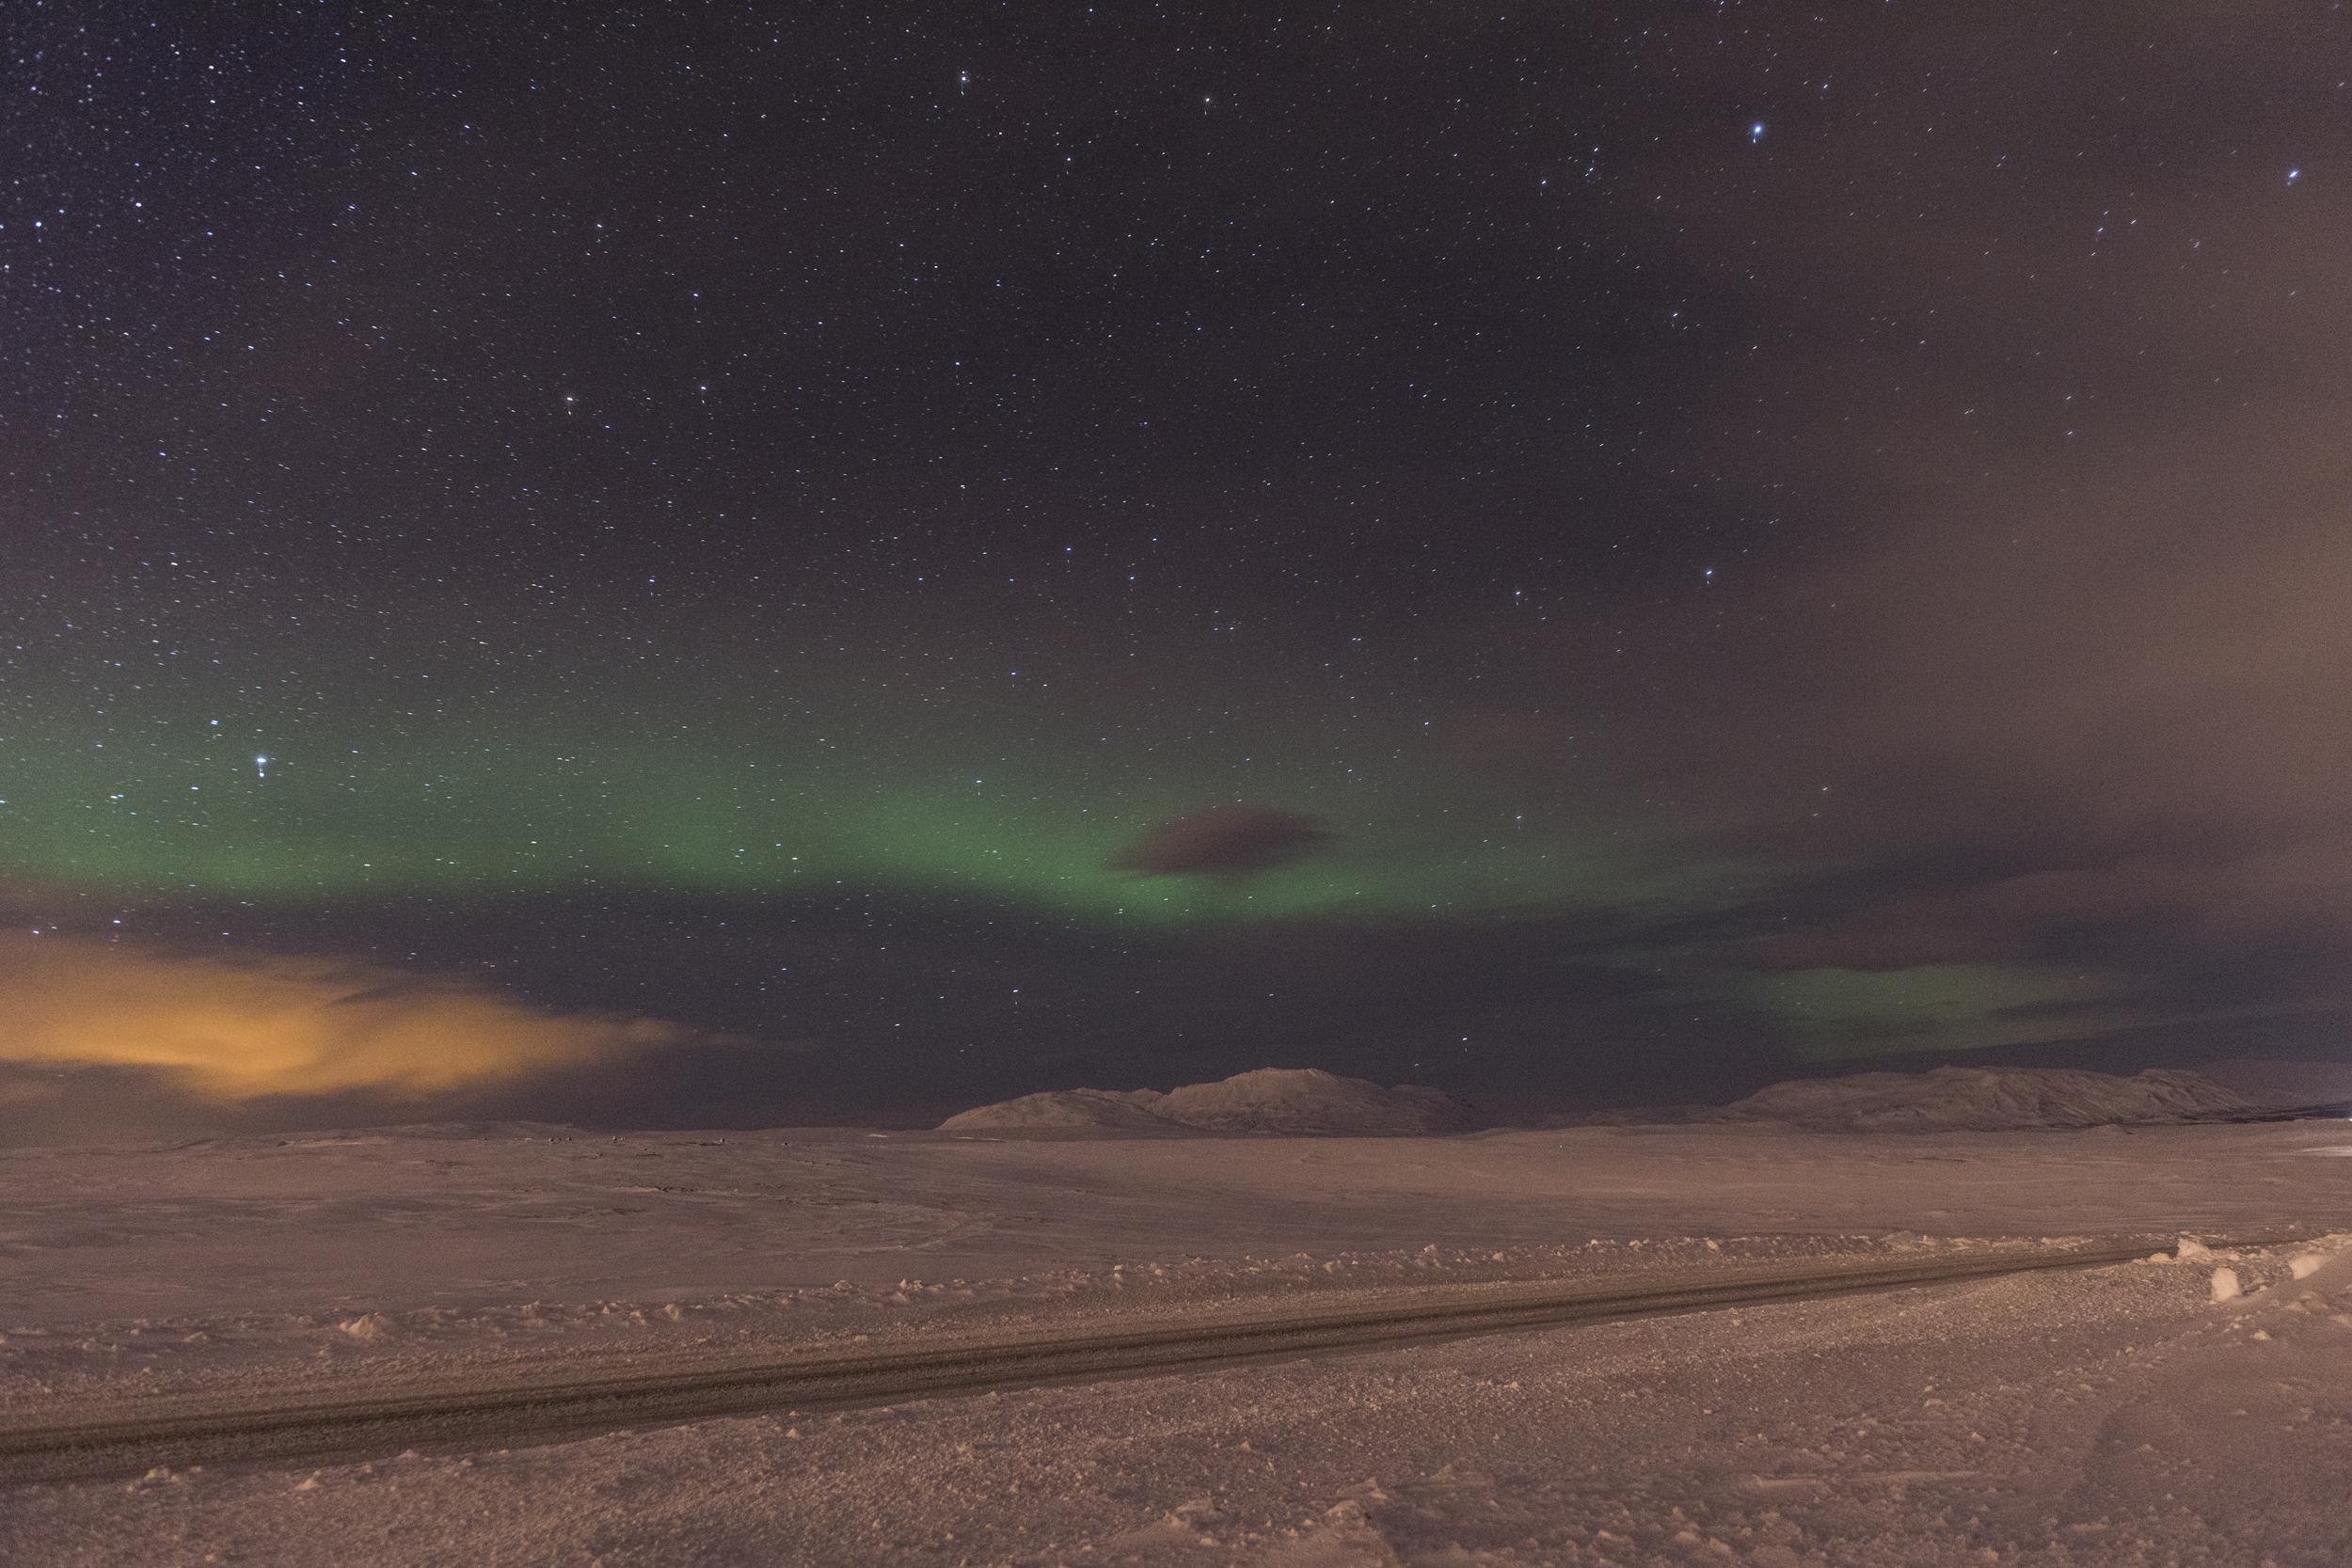 Iceland_03_30x20_web.jpg